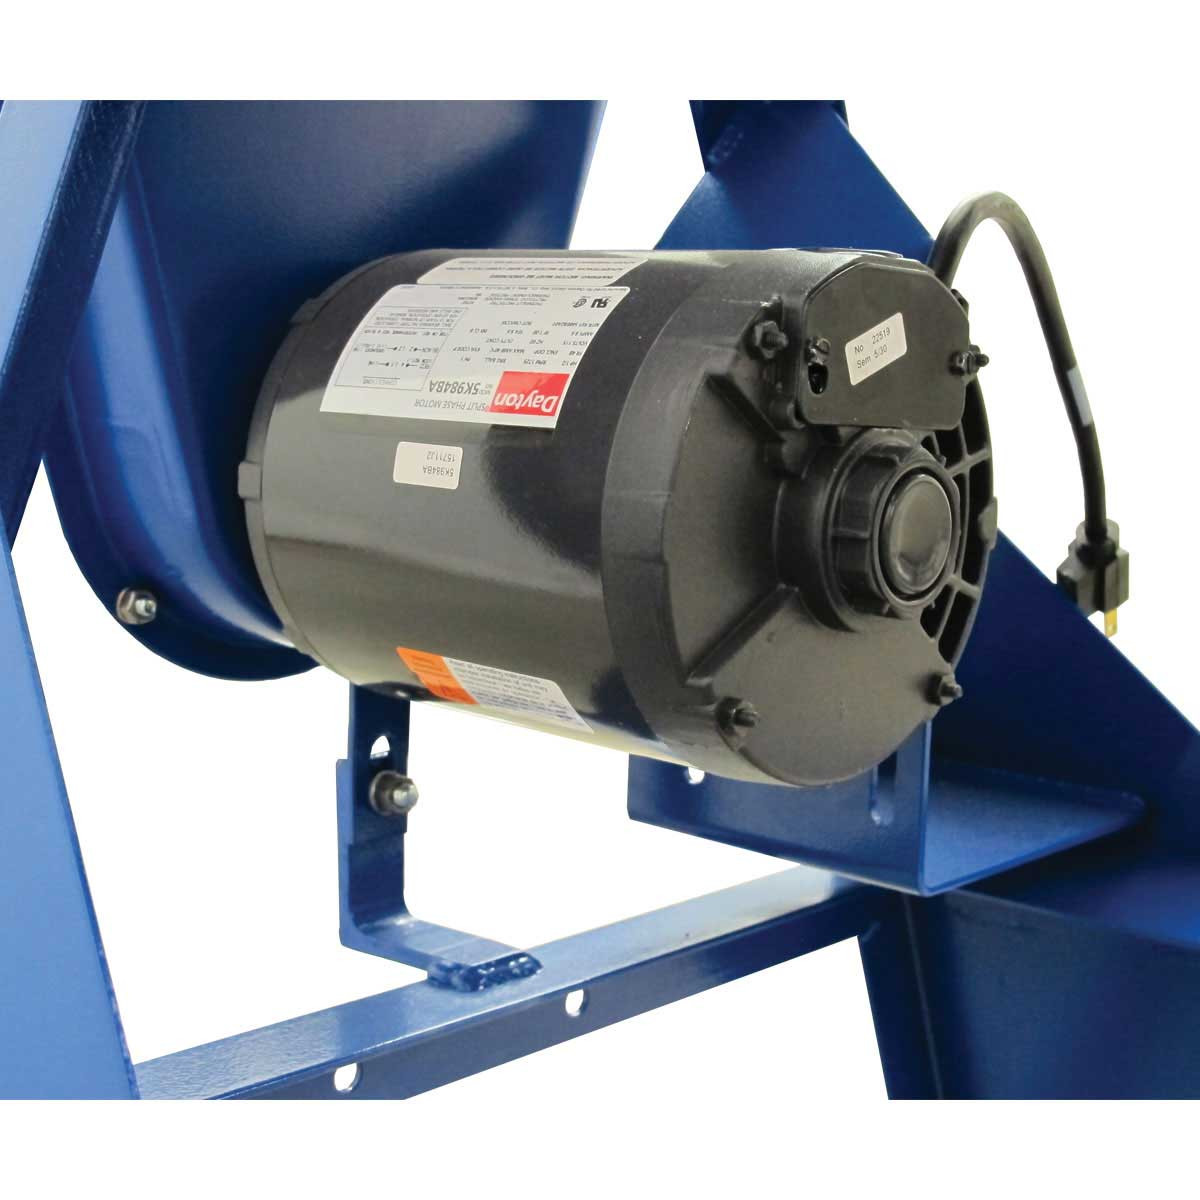 Cleform Gilson 300UT Mixer motor